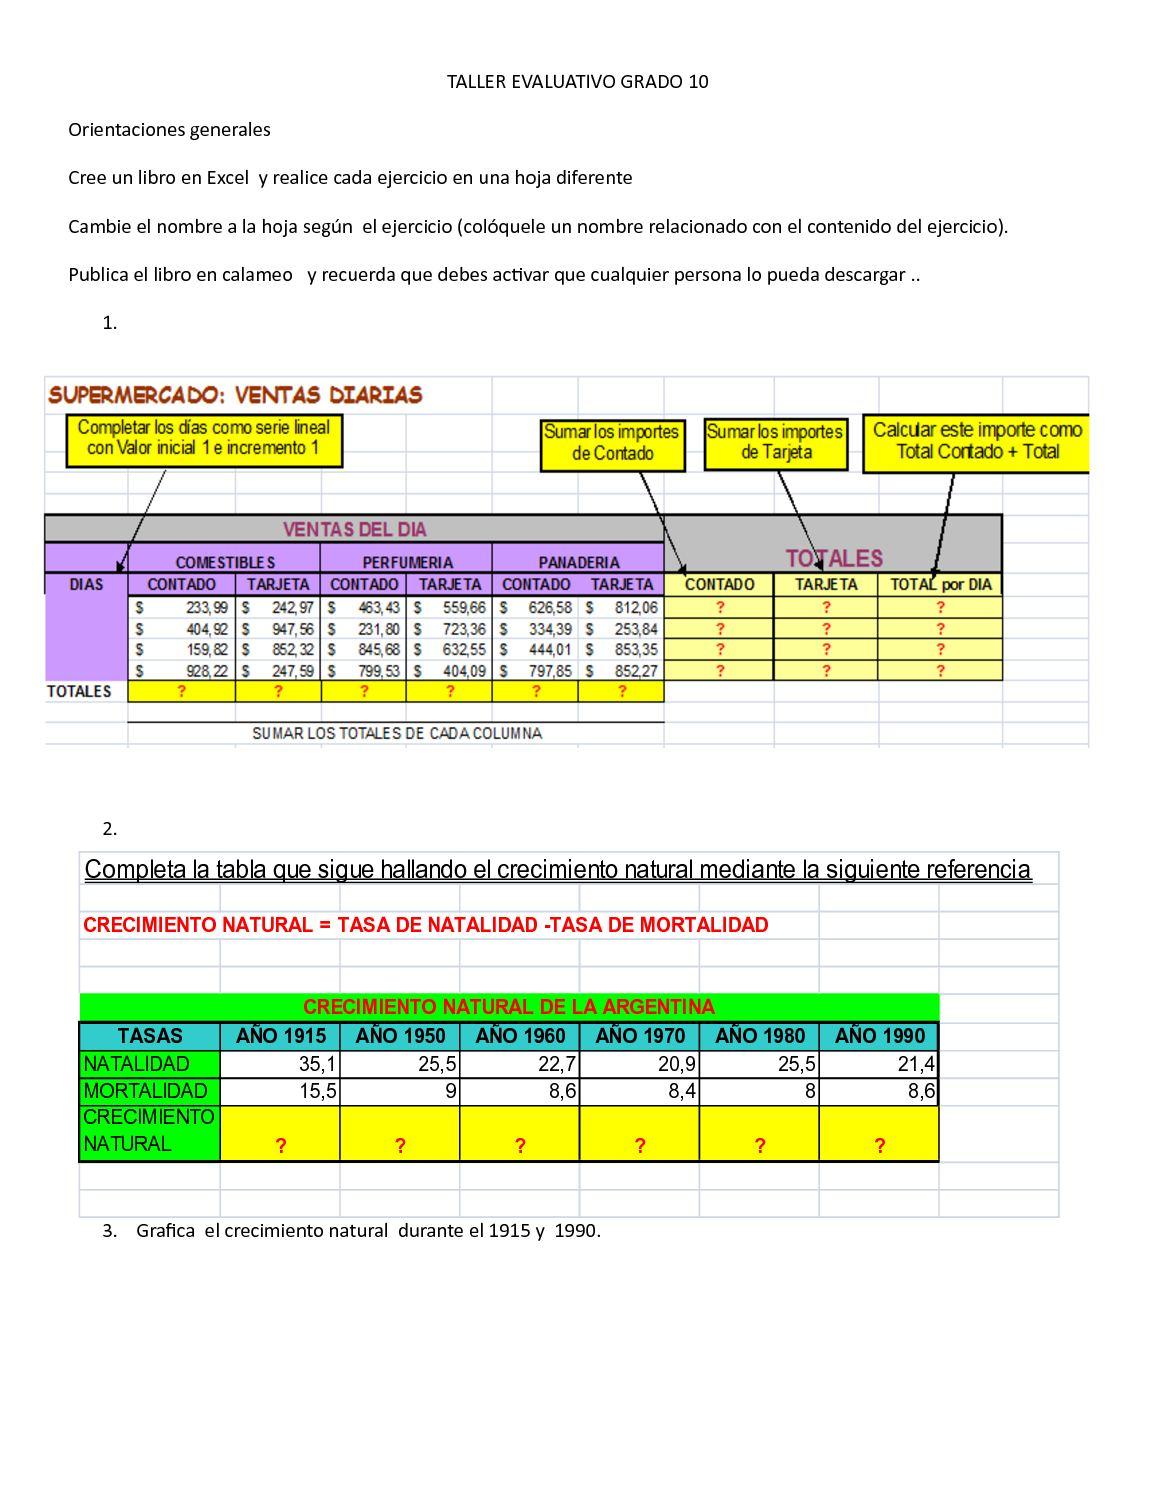 Dssr 120 Form - Photo Trend & Ideas